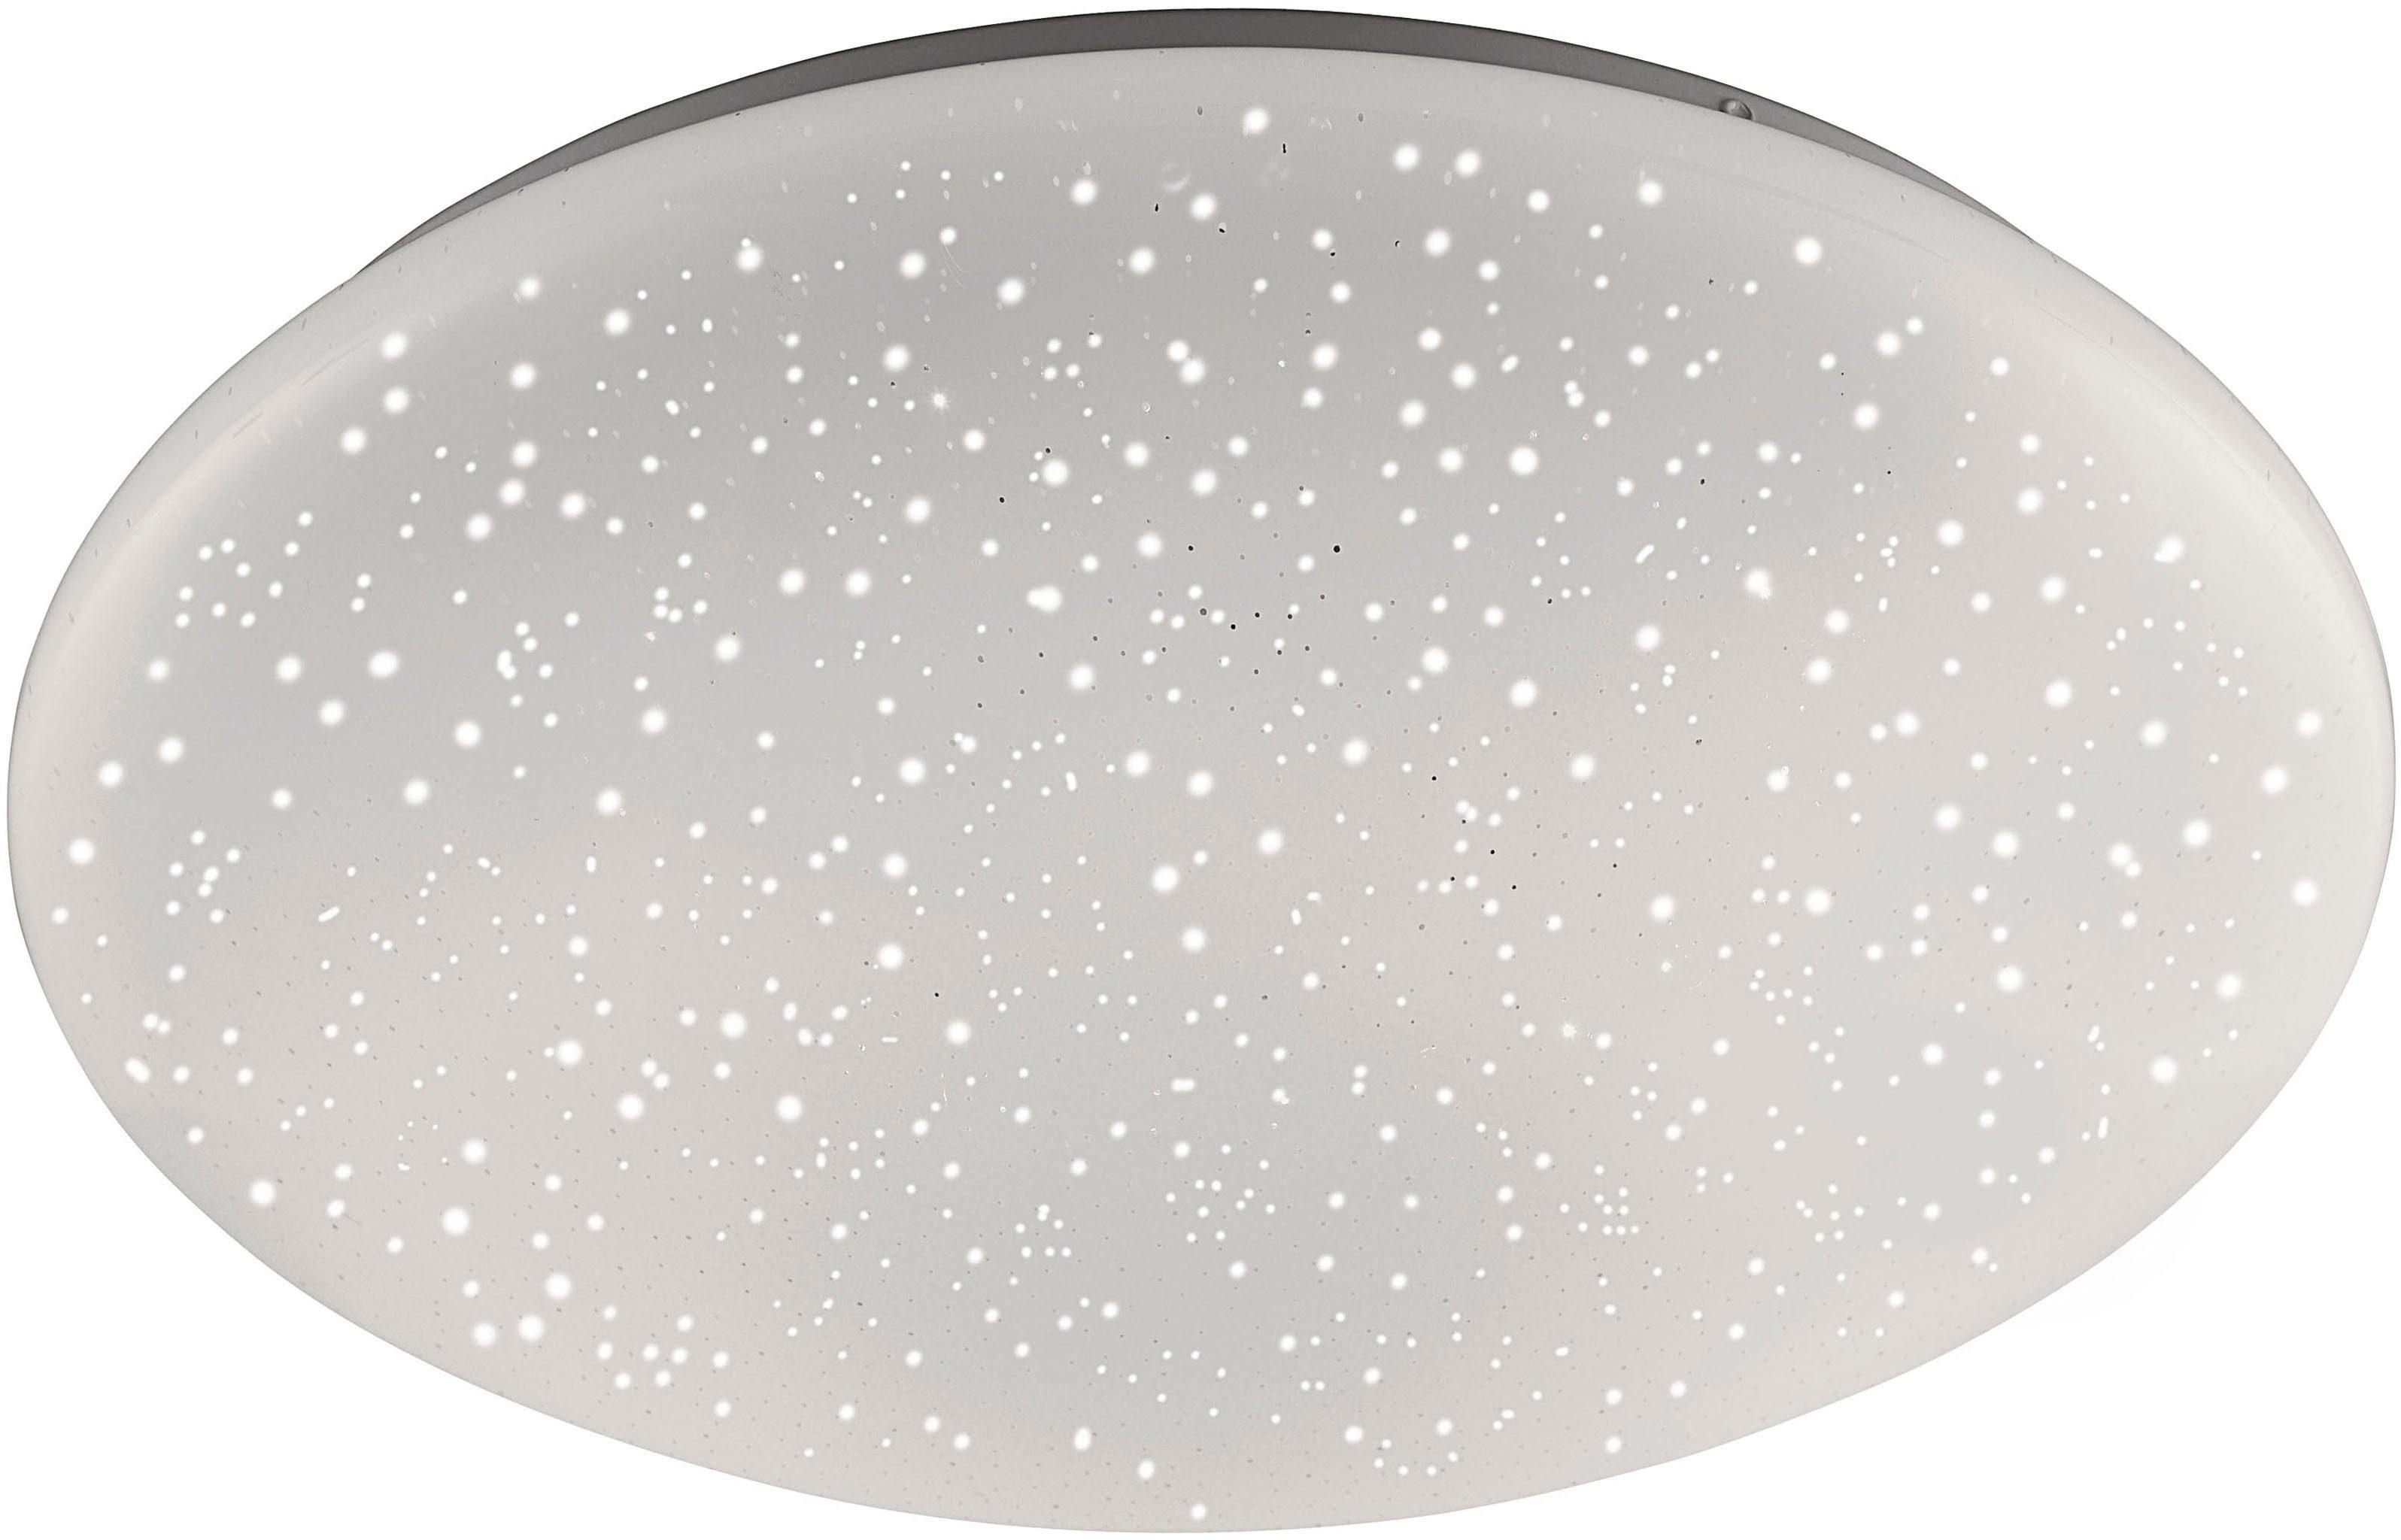 24 Watt LED Decken Leuchte Wohn Schlaf Zimmer Sternen Himmel Effekt Big Light